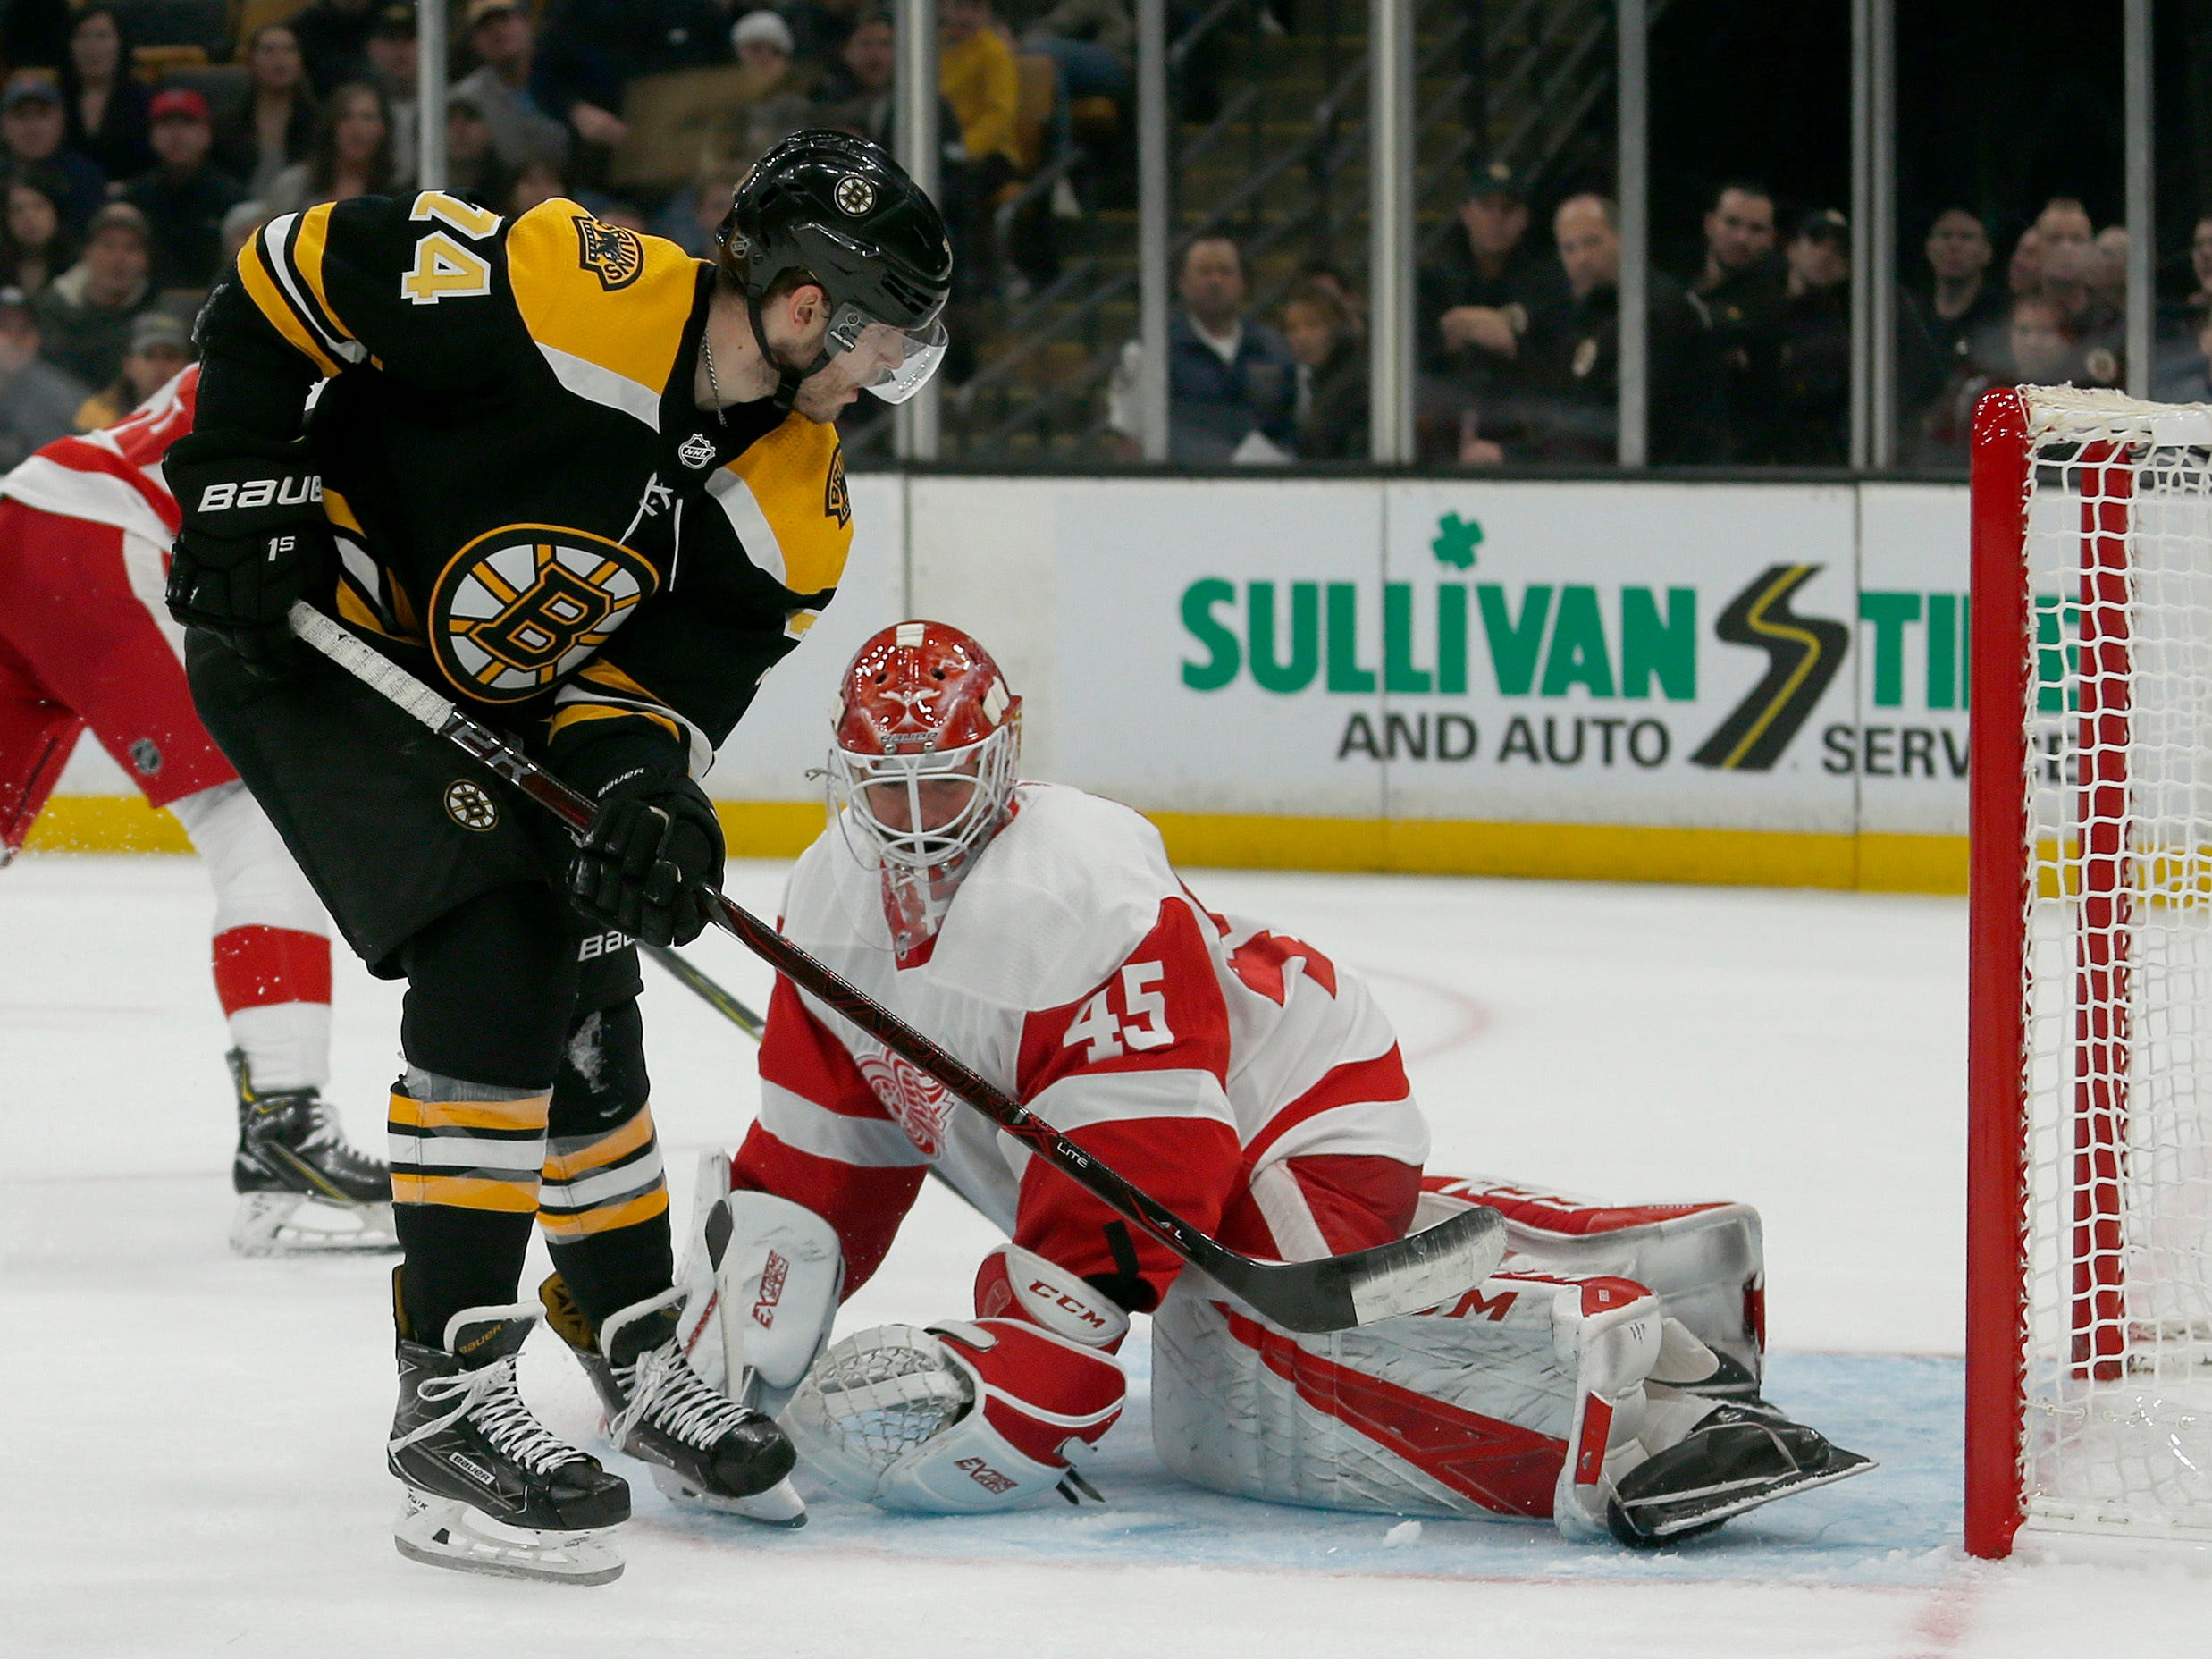 Boston Bruins left wing Jake DeBrusk (74) scores a goal past Detroit Red Wings goaltender Jonathan Bernier (45) during the second period.